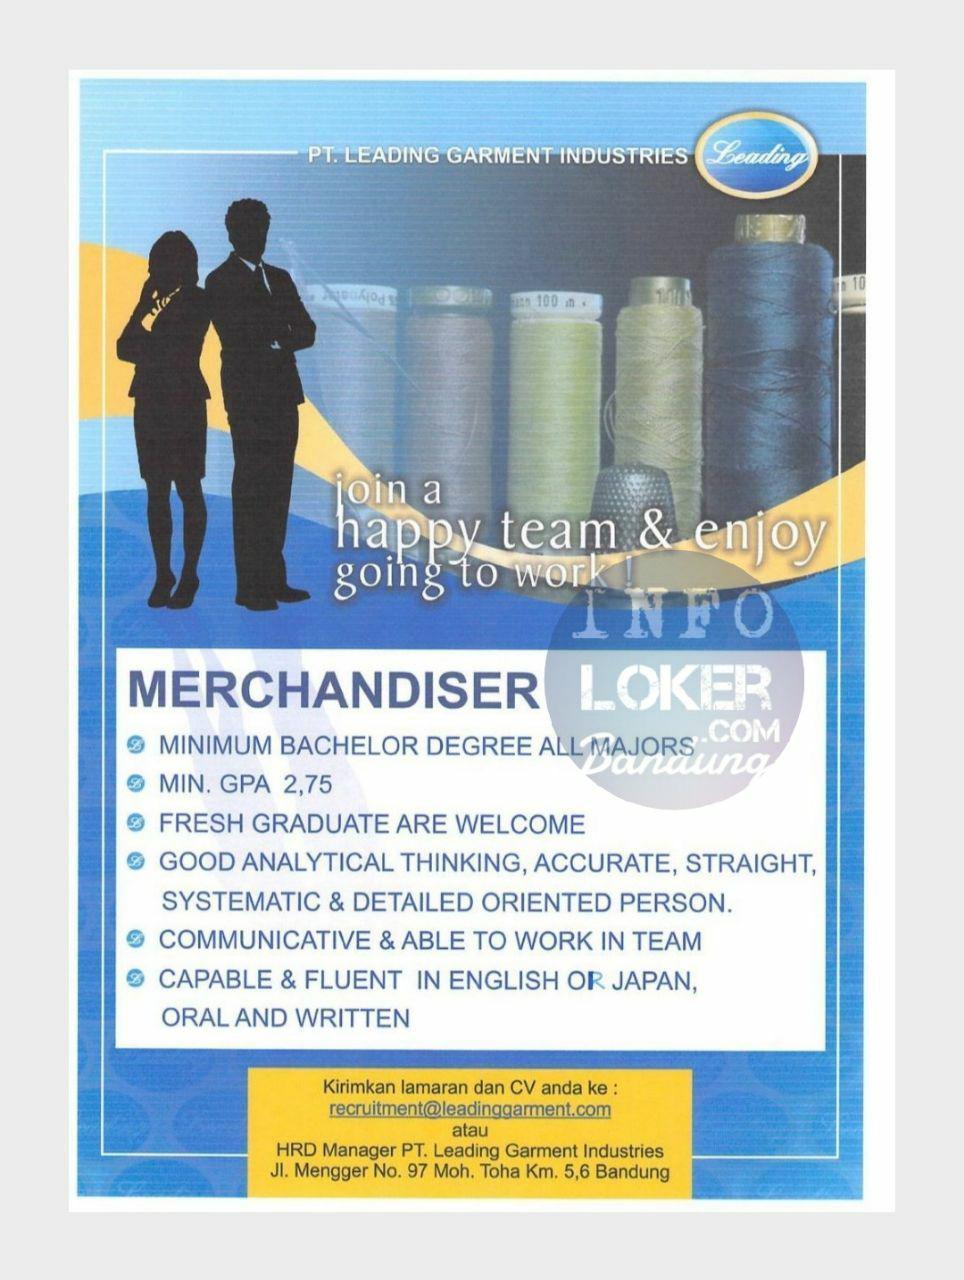 Lowongan Kerja PT. Leading Garment Industries Bandung Januari 2018